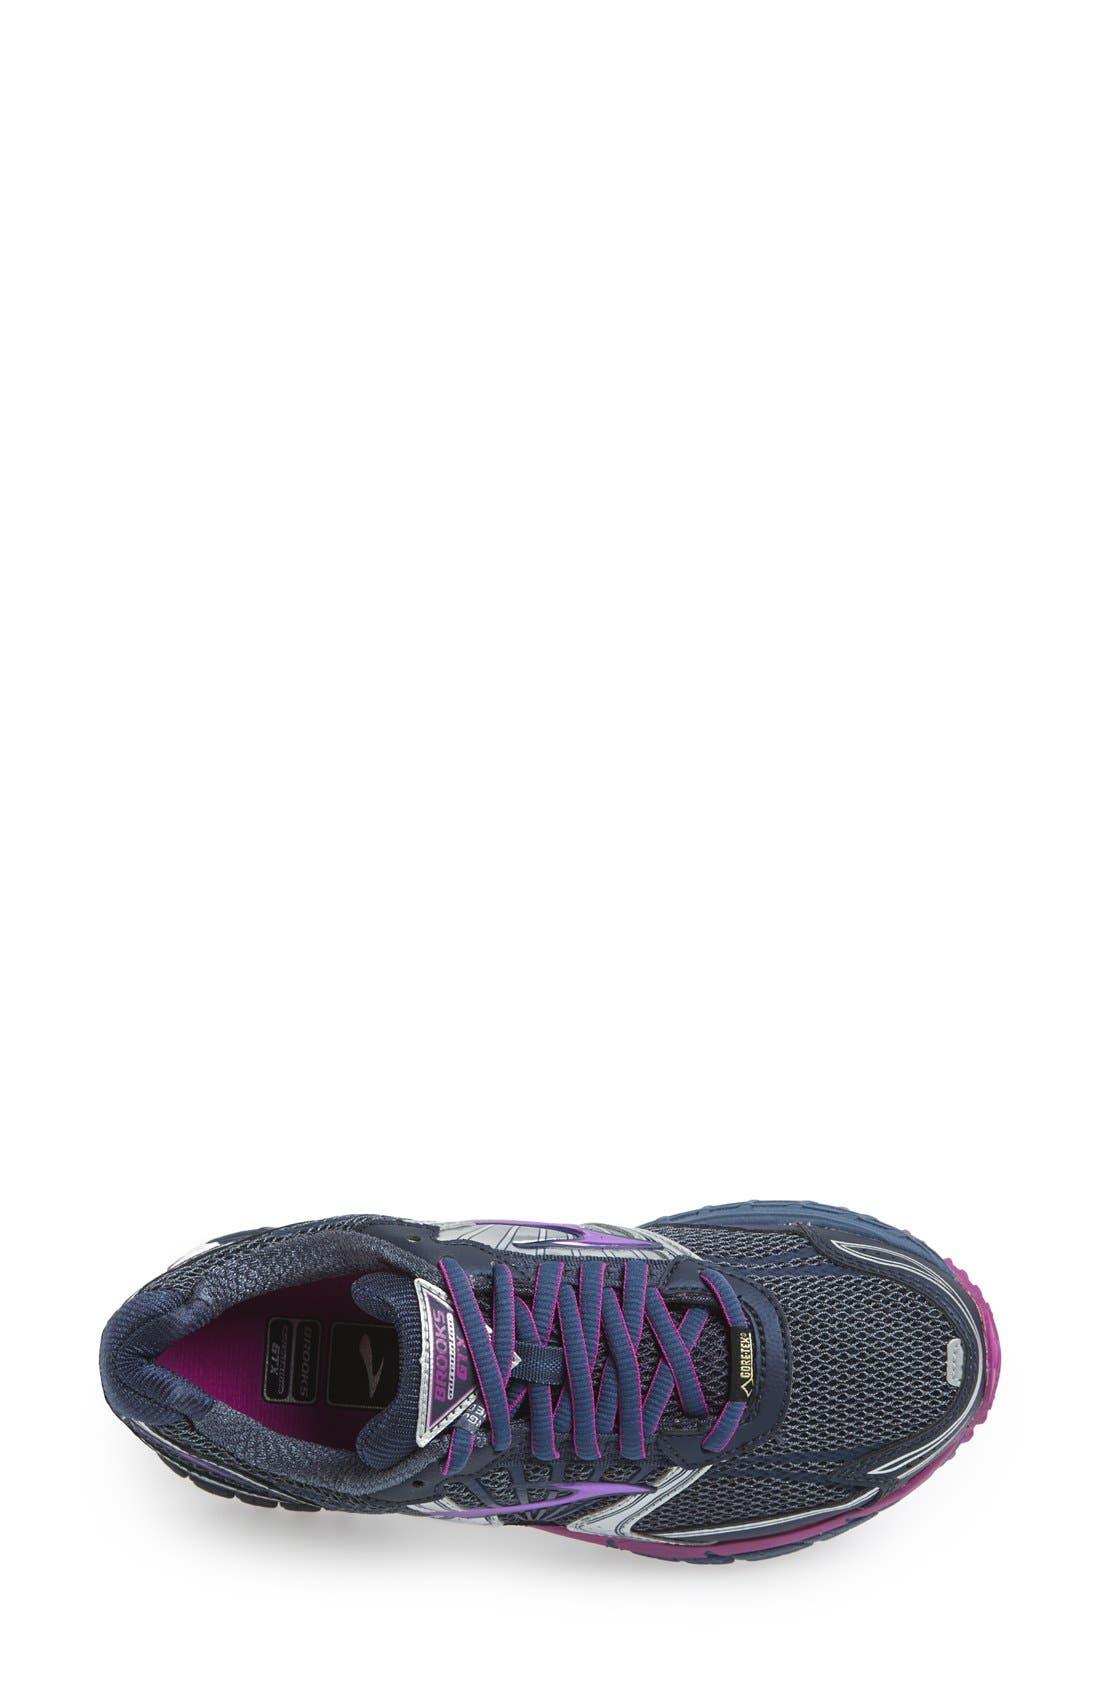 'Adrenaline ASR 11 GTX' Waterproof Running Shoe,                             Alternate thumbnail 4, color,                             021